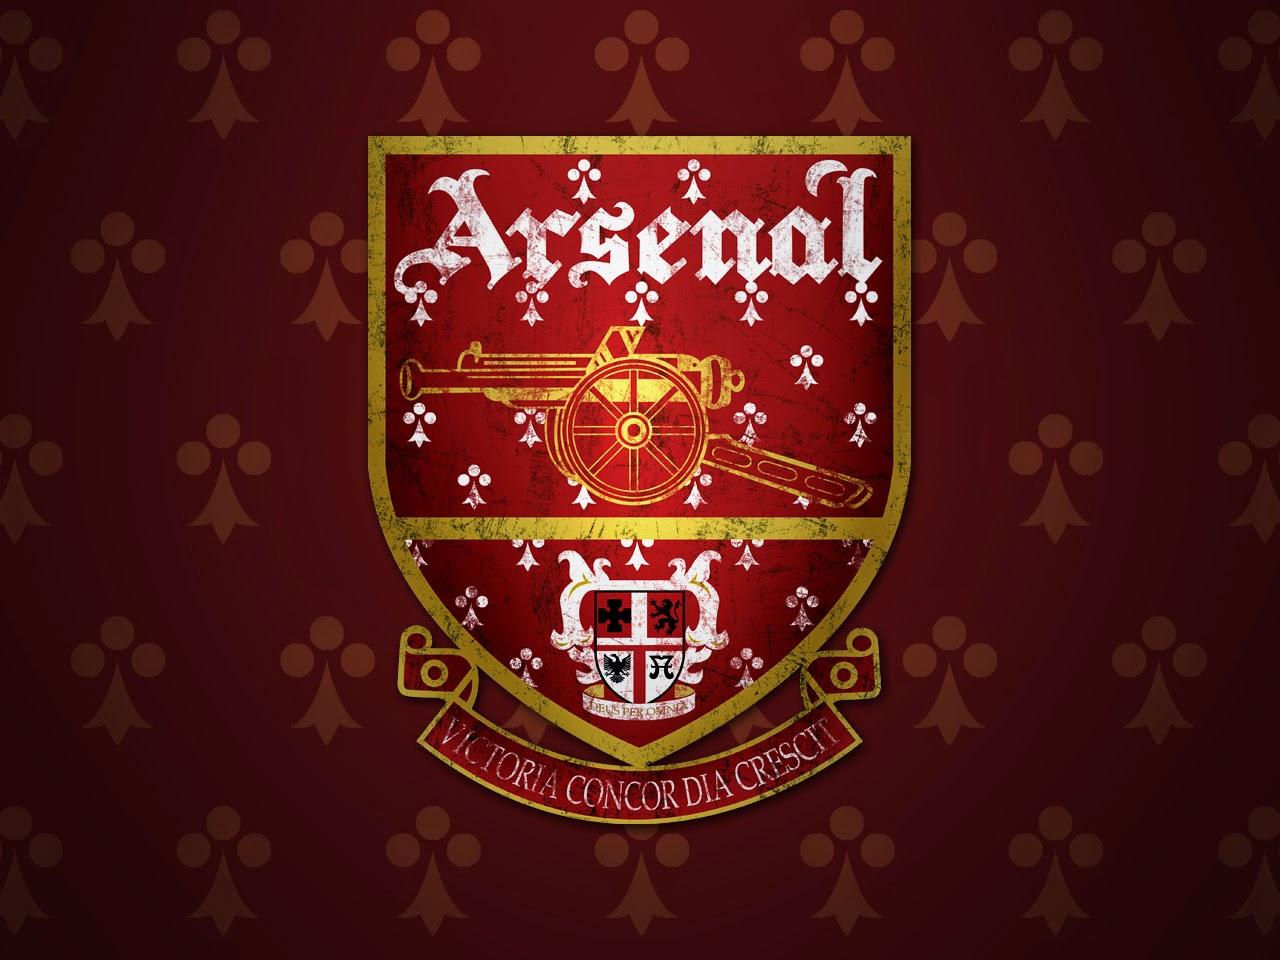 Iphone 5 Arsenal Wallpaper Arsenal Football Club Wallpaper Football Wallpaper Hd